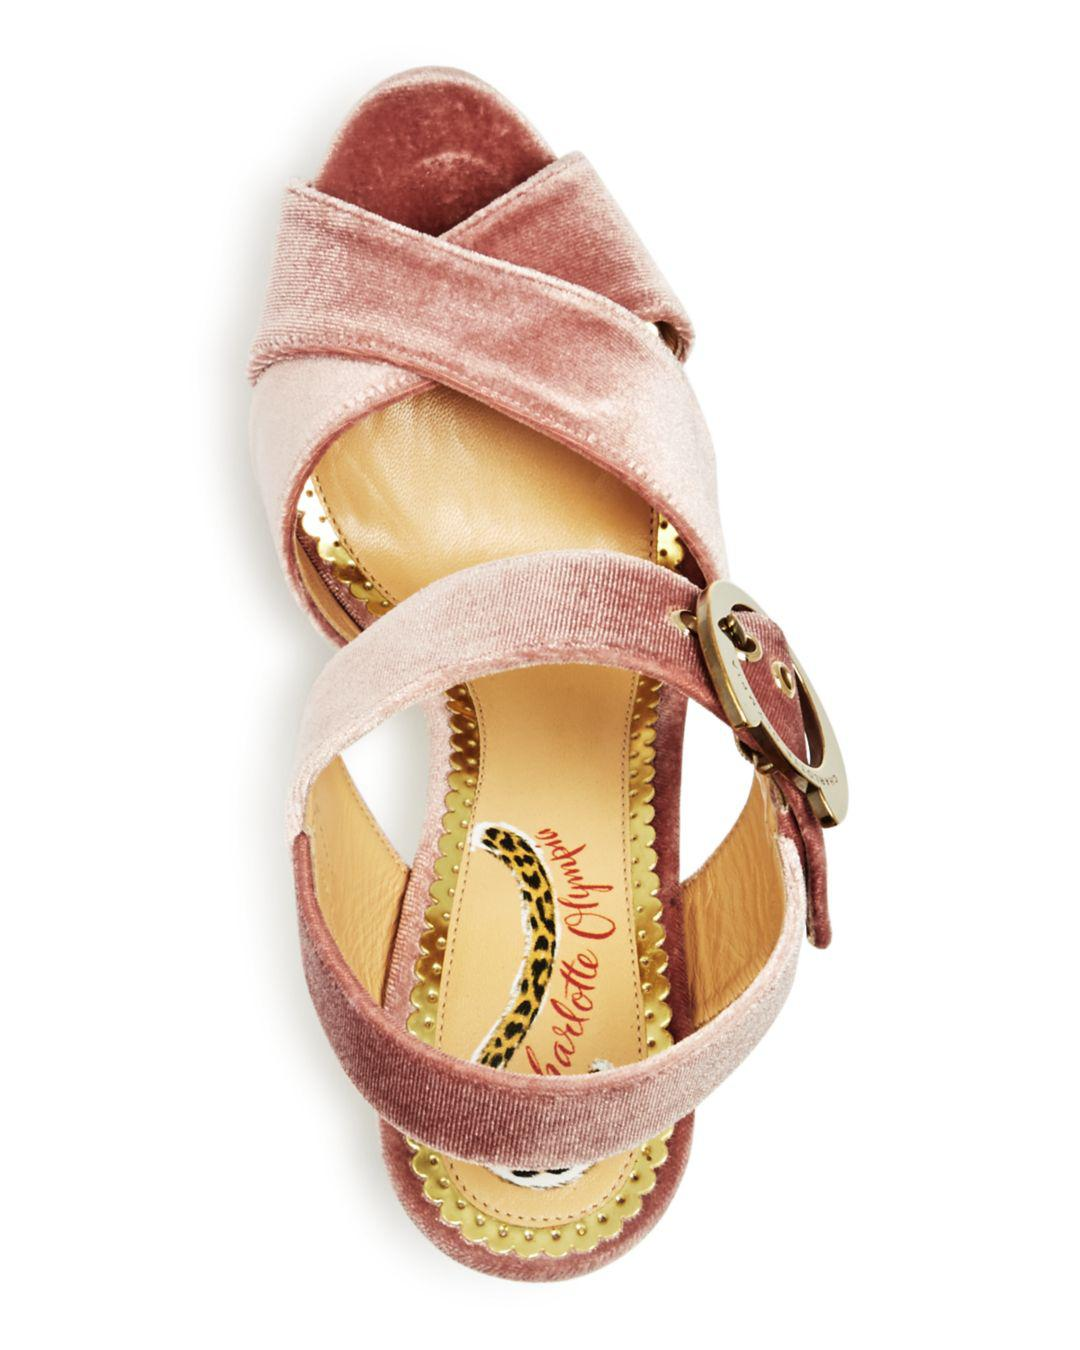 21896b3949cb Charlotte Olympia - Pink Women s Catbuck Velvet High-heel Platform Sandals  - Lyst. View fullscreen